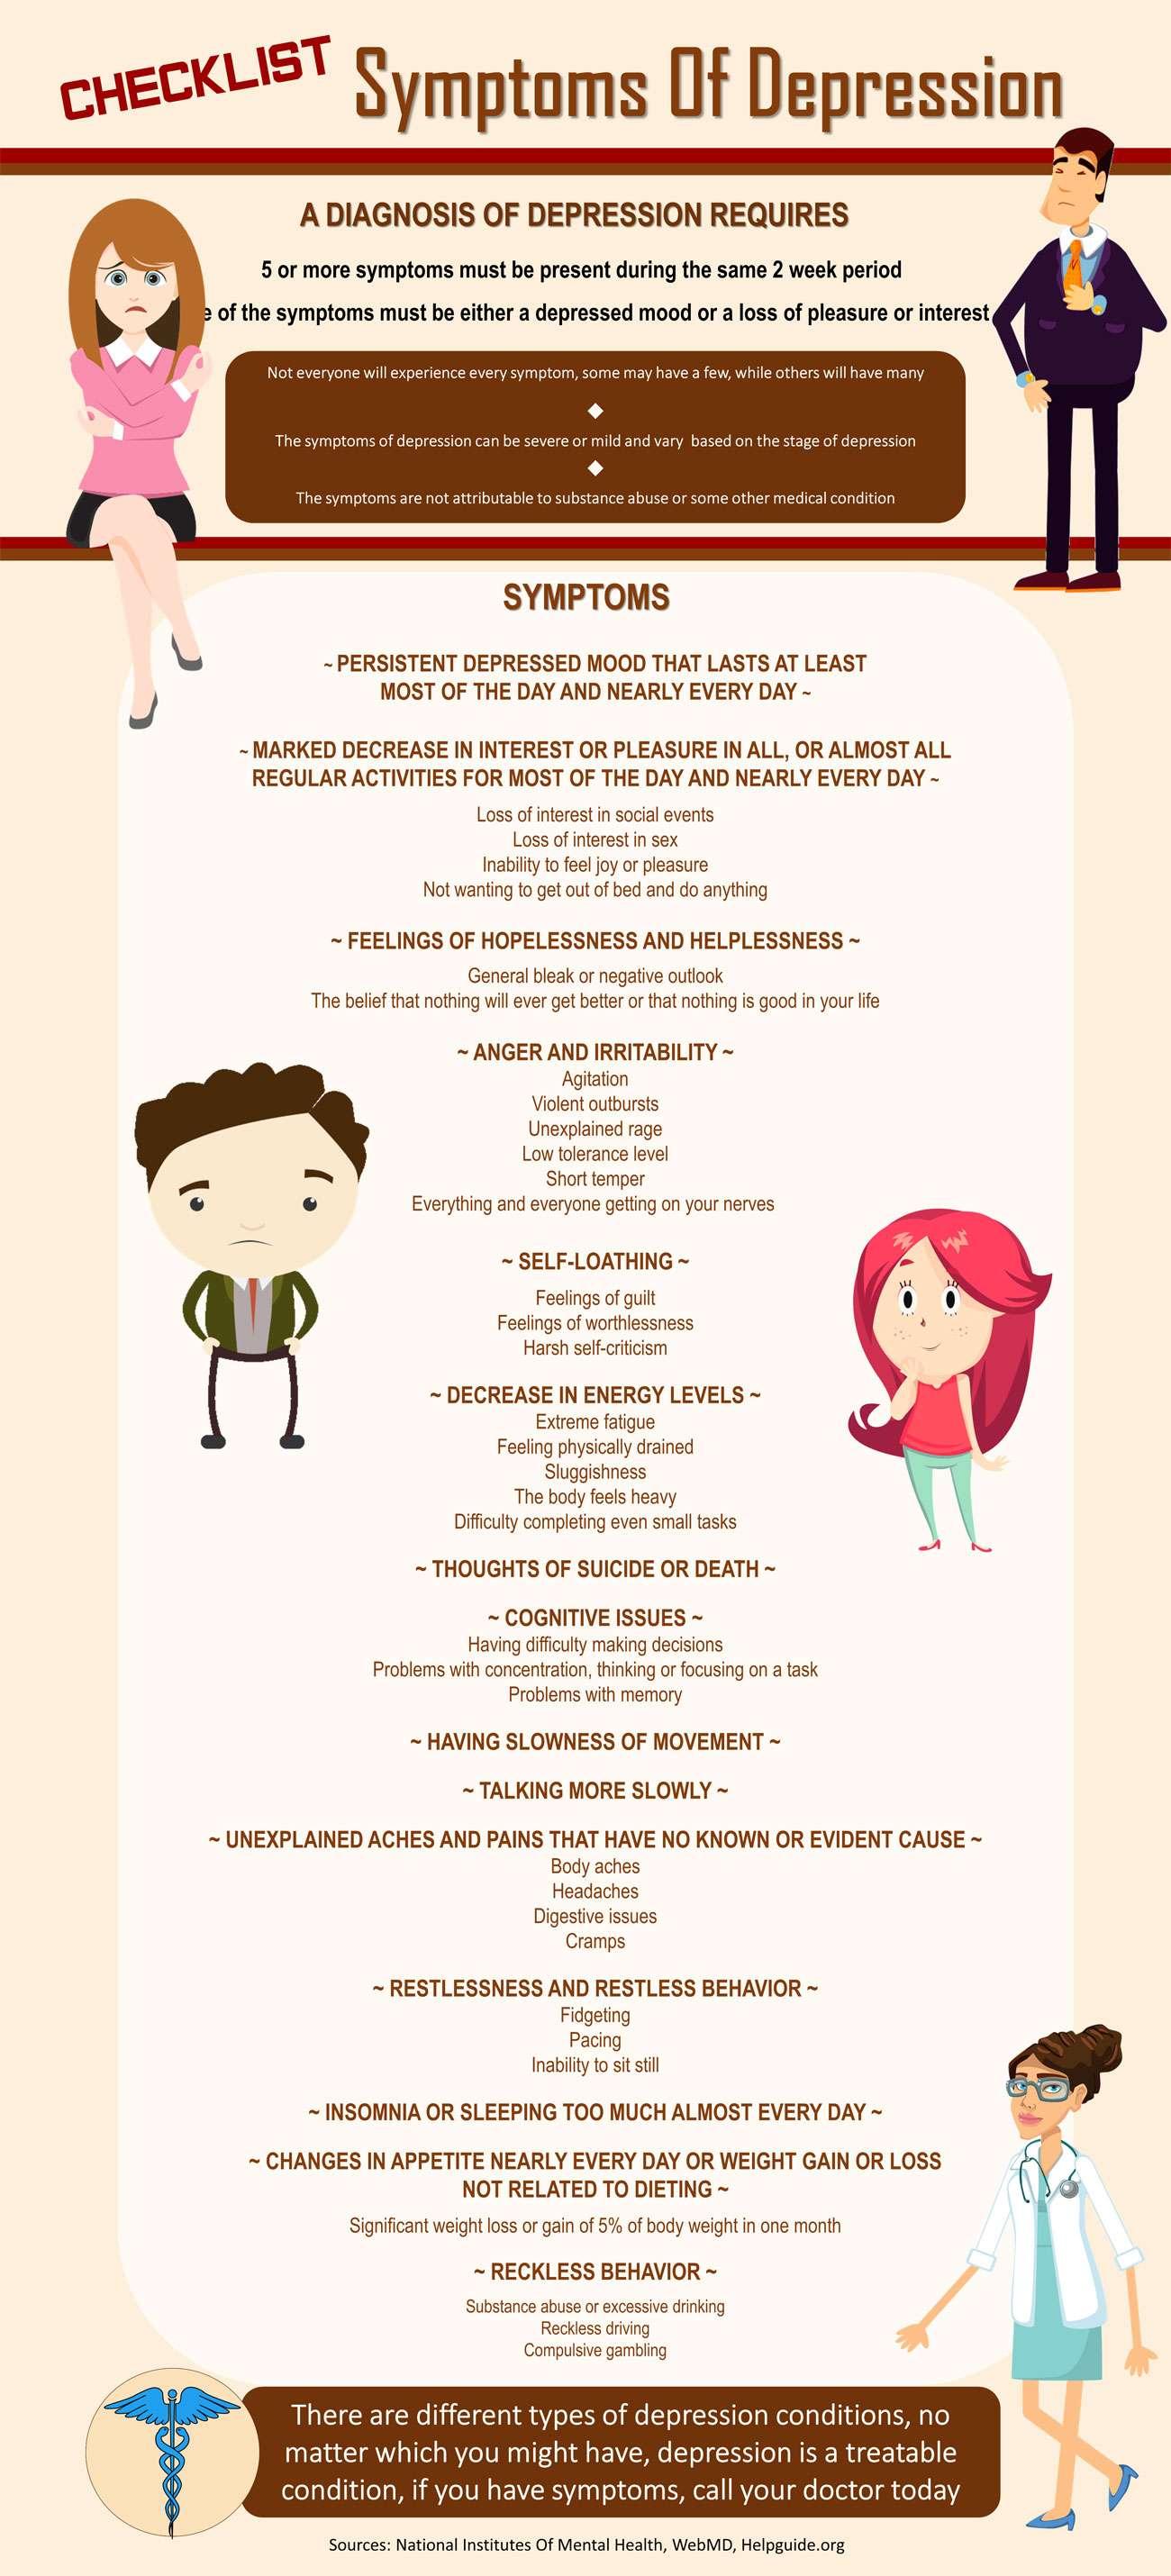 Symptoms of Depression Checklist